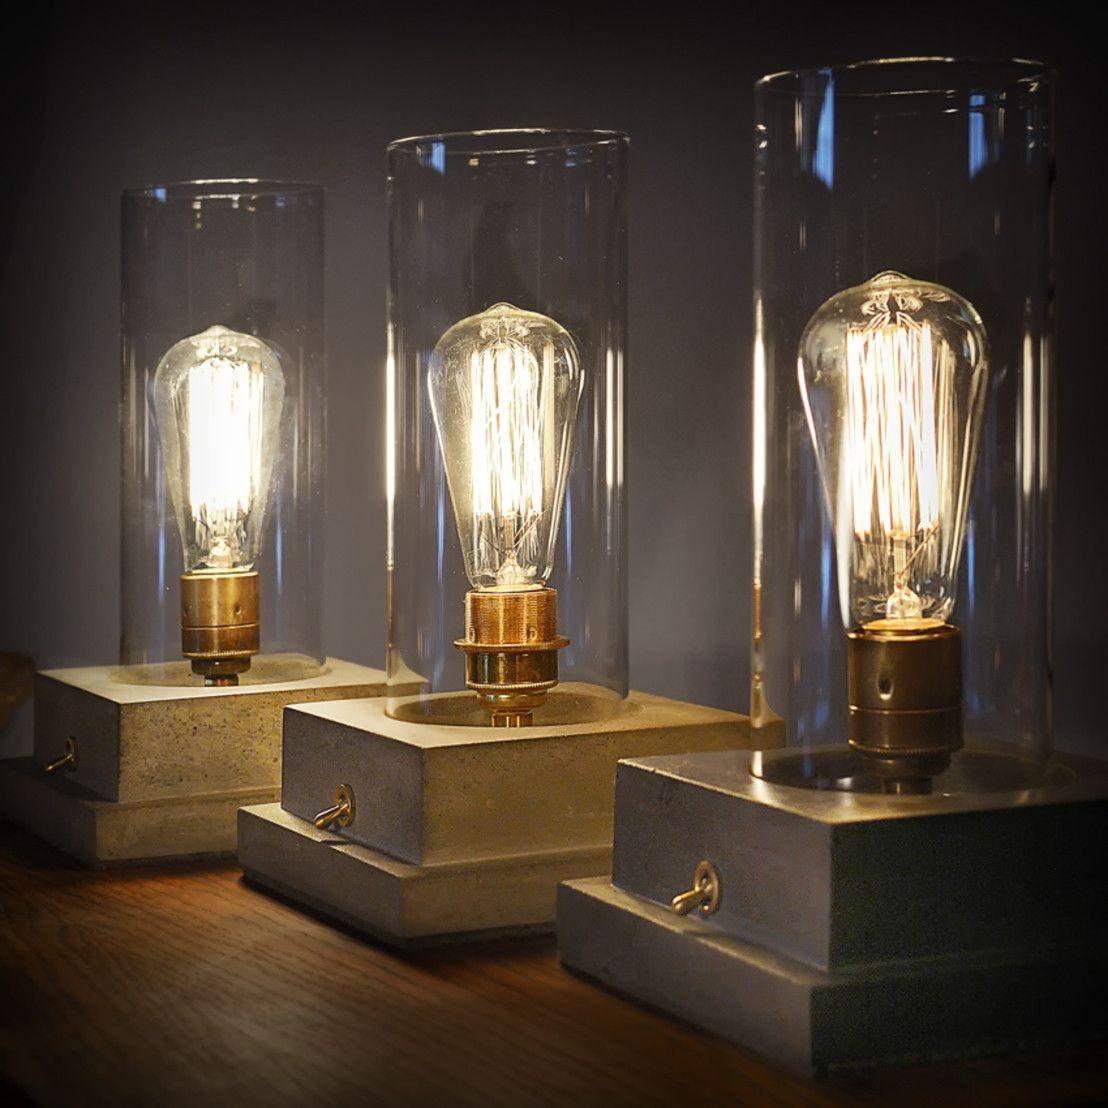 coole lampen beleuchtung lampen leuchten pinterest. Black Bedroom Furniture Sets. Home Design Ideas